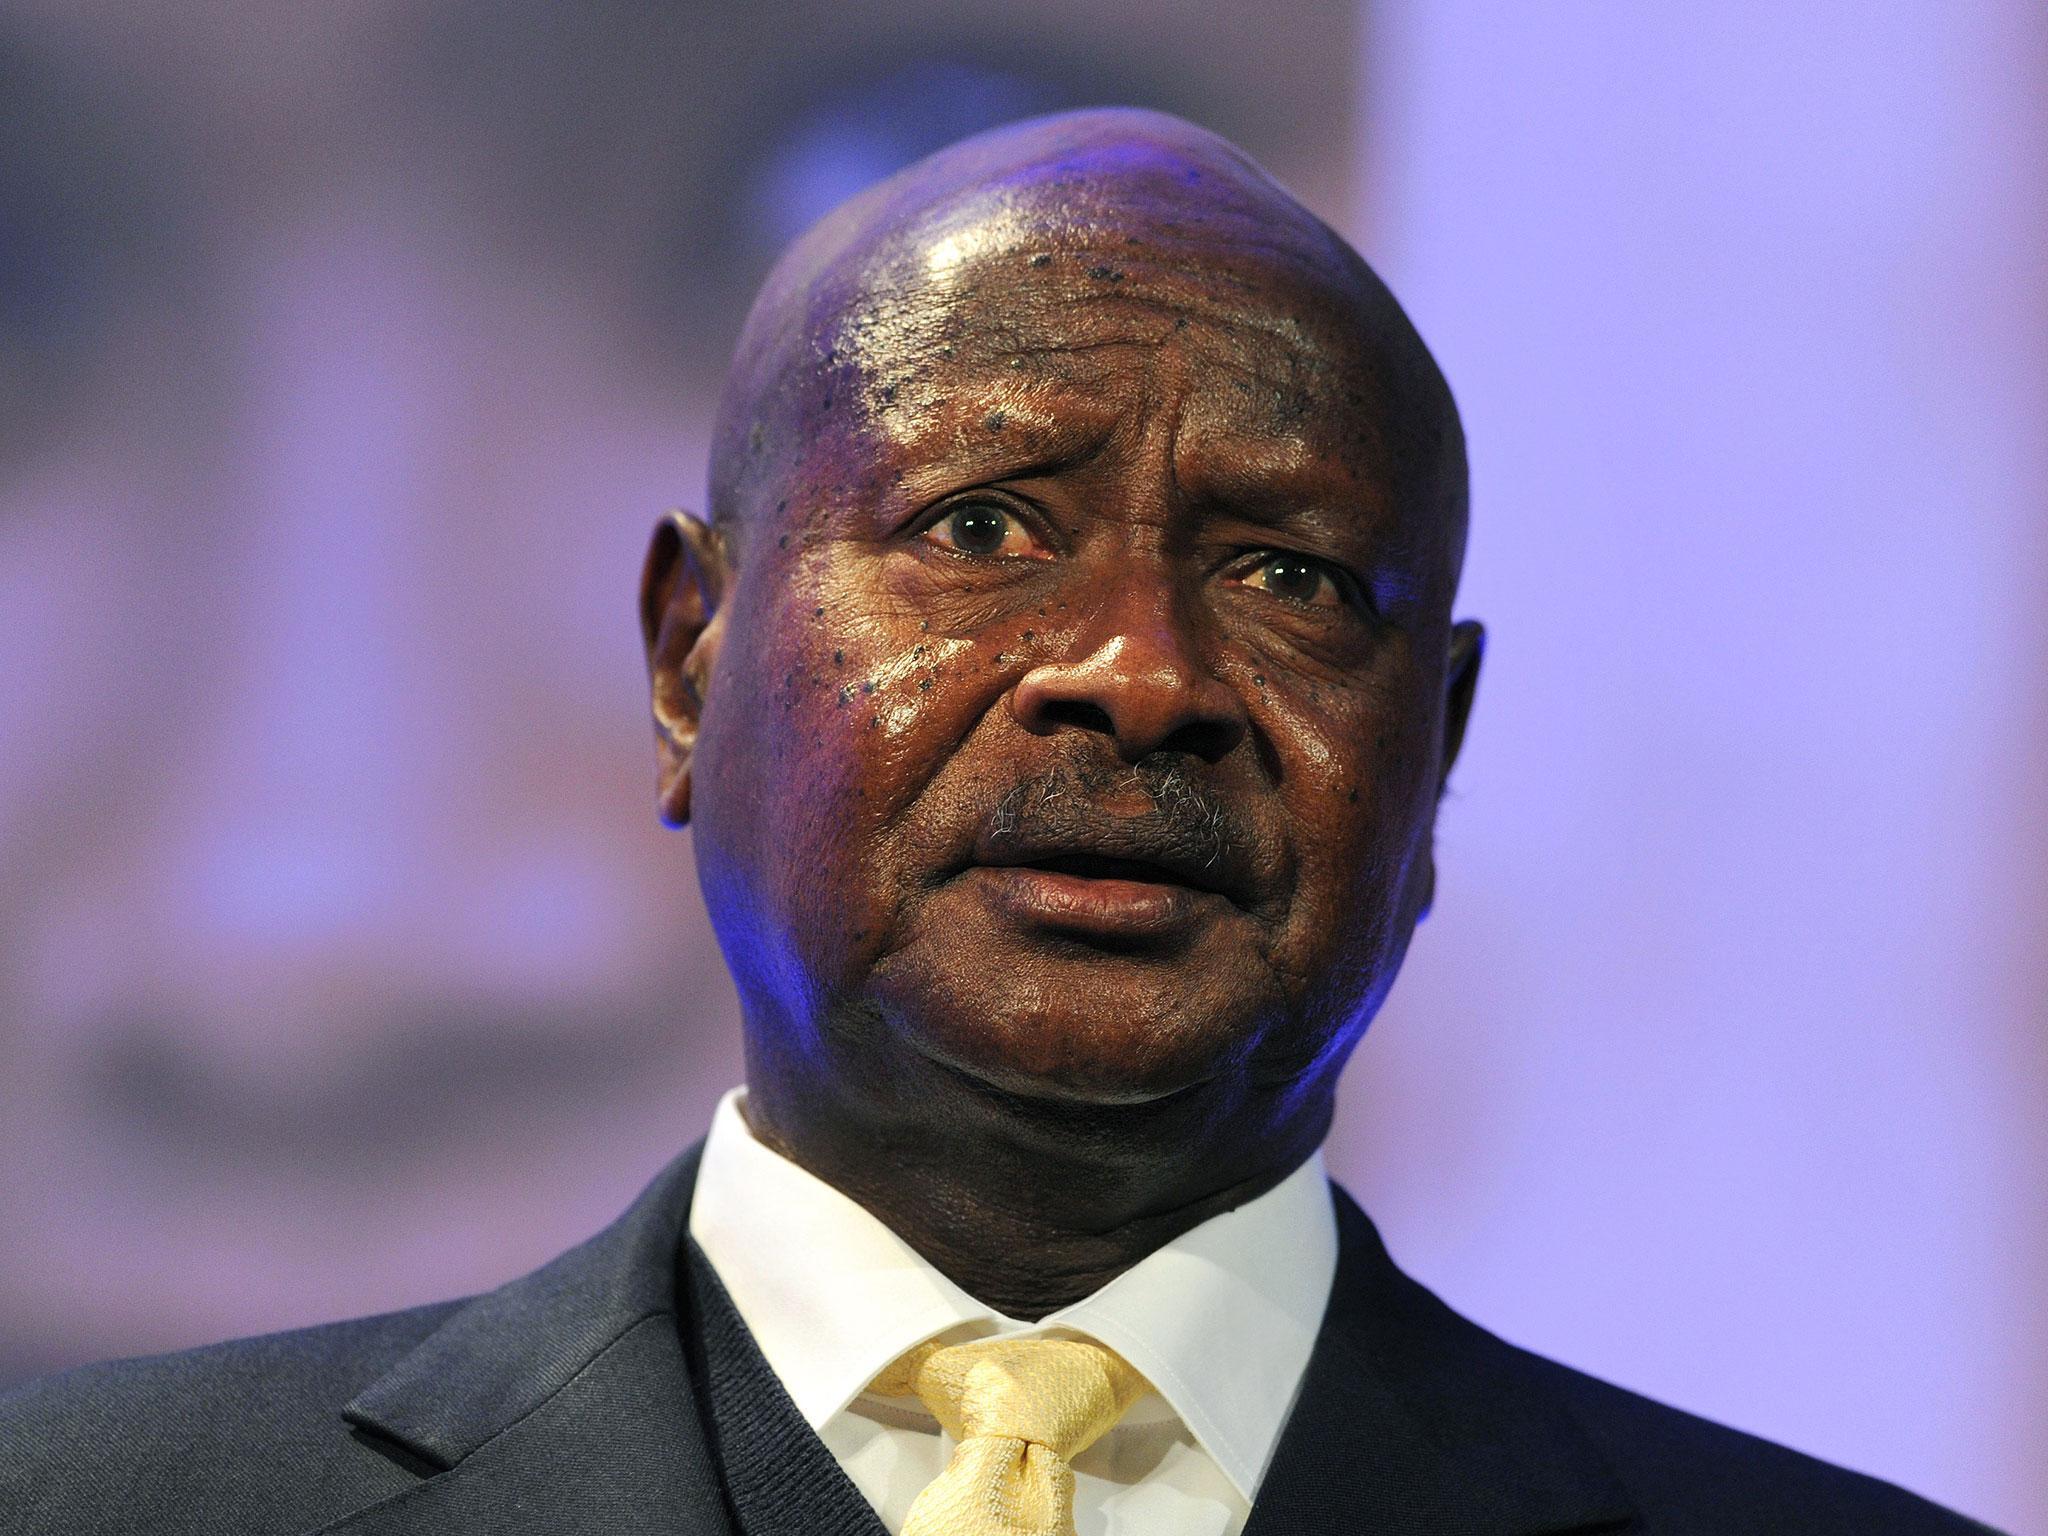 Ugandan election Museveni